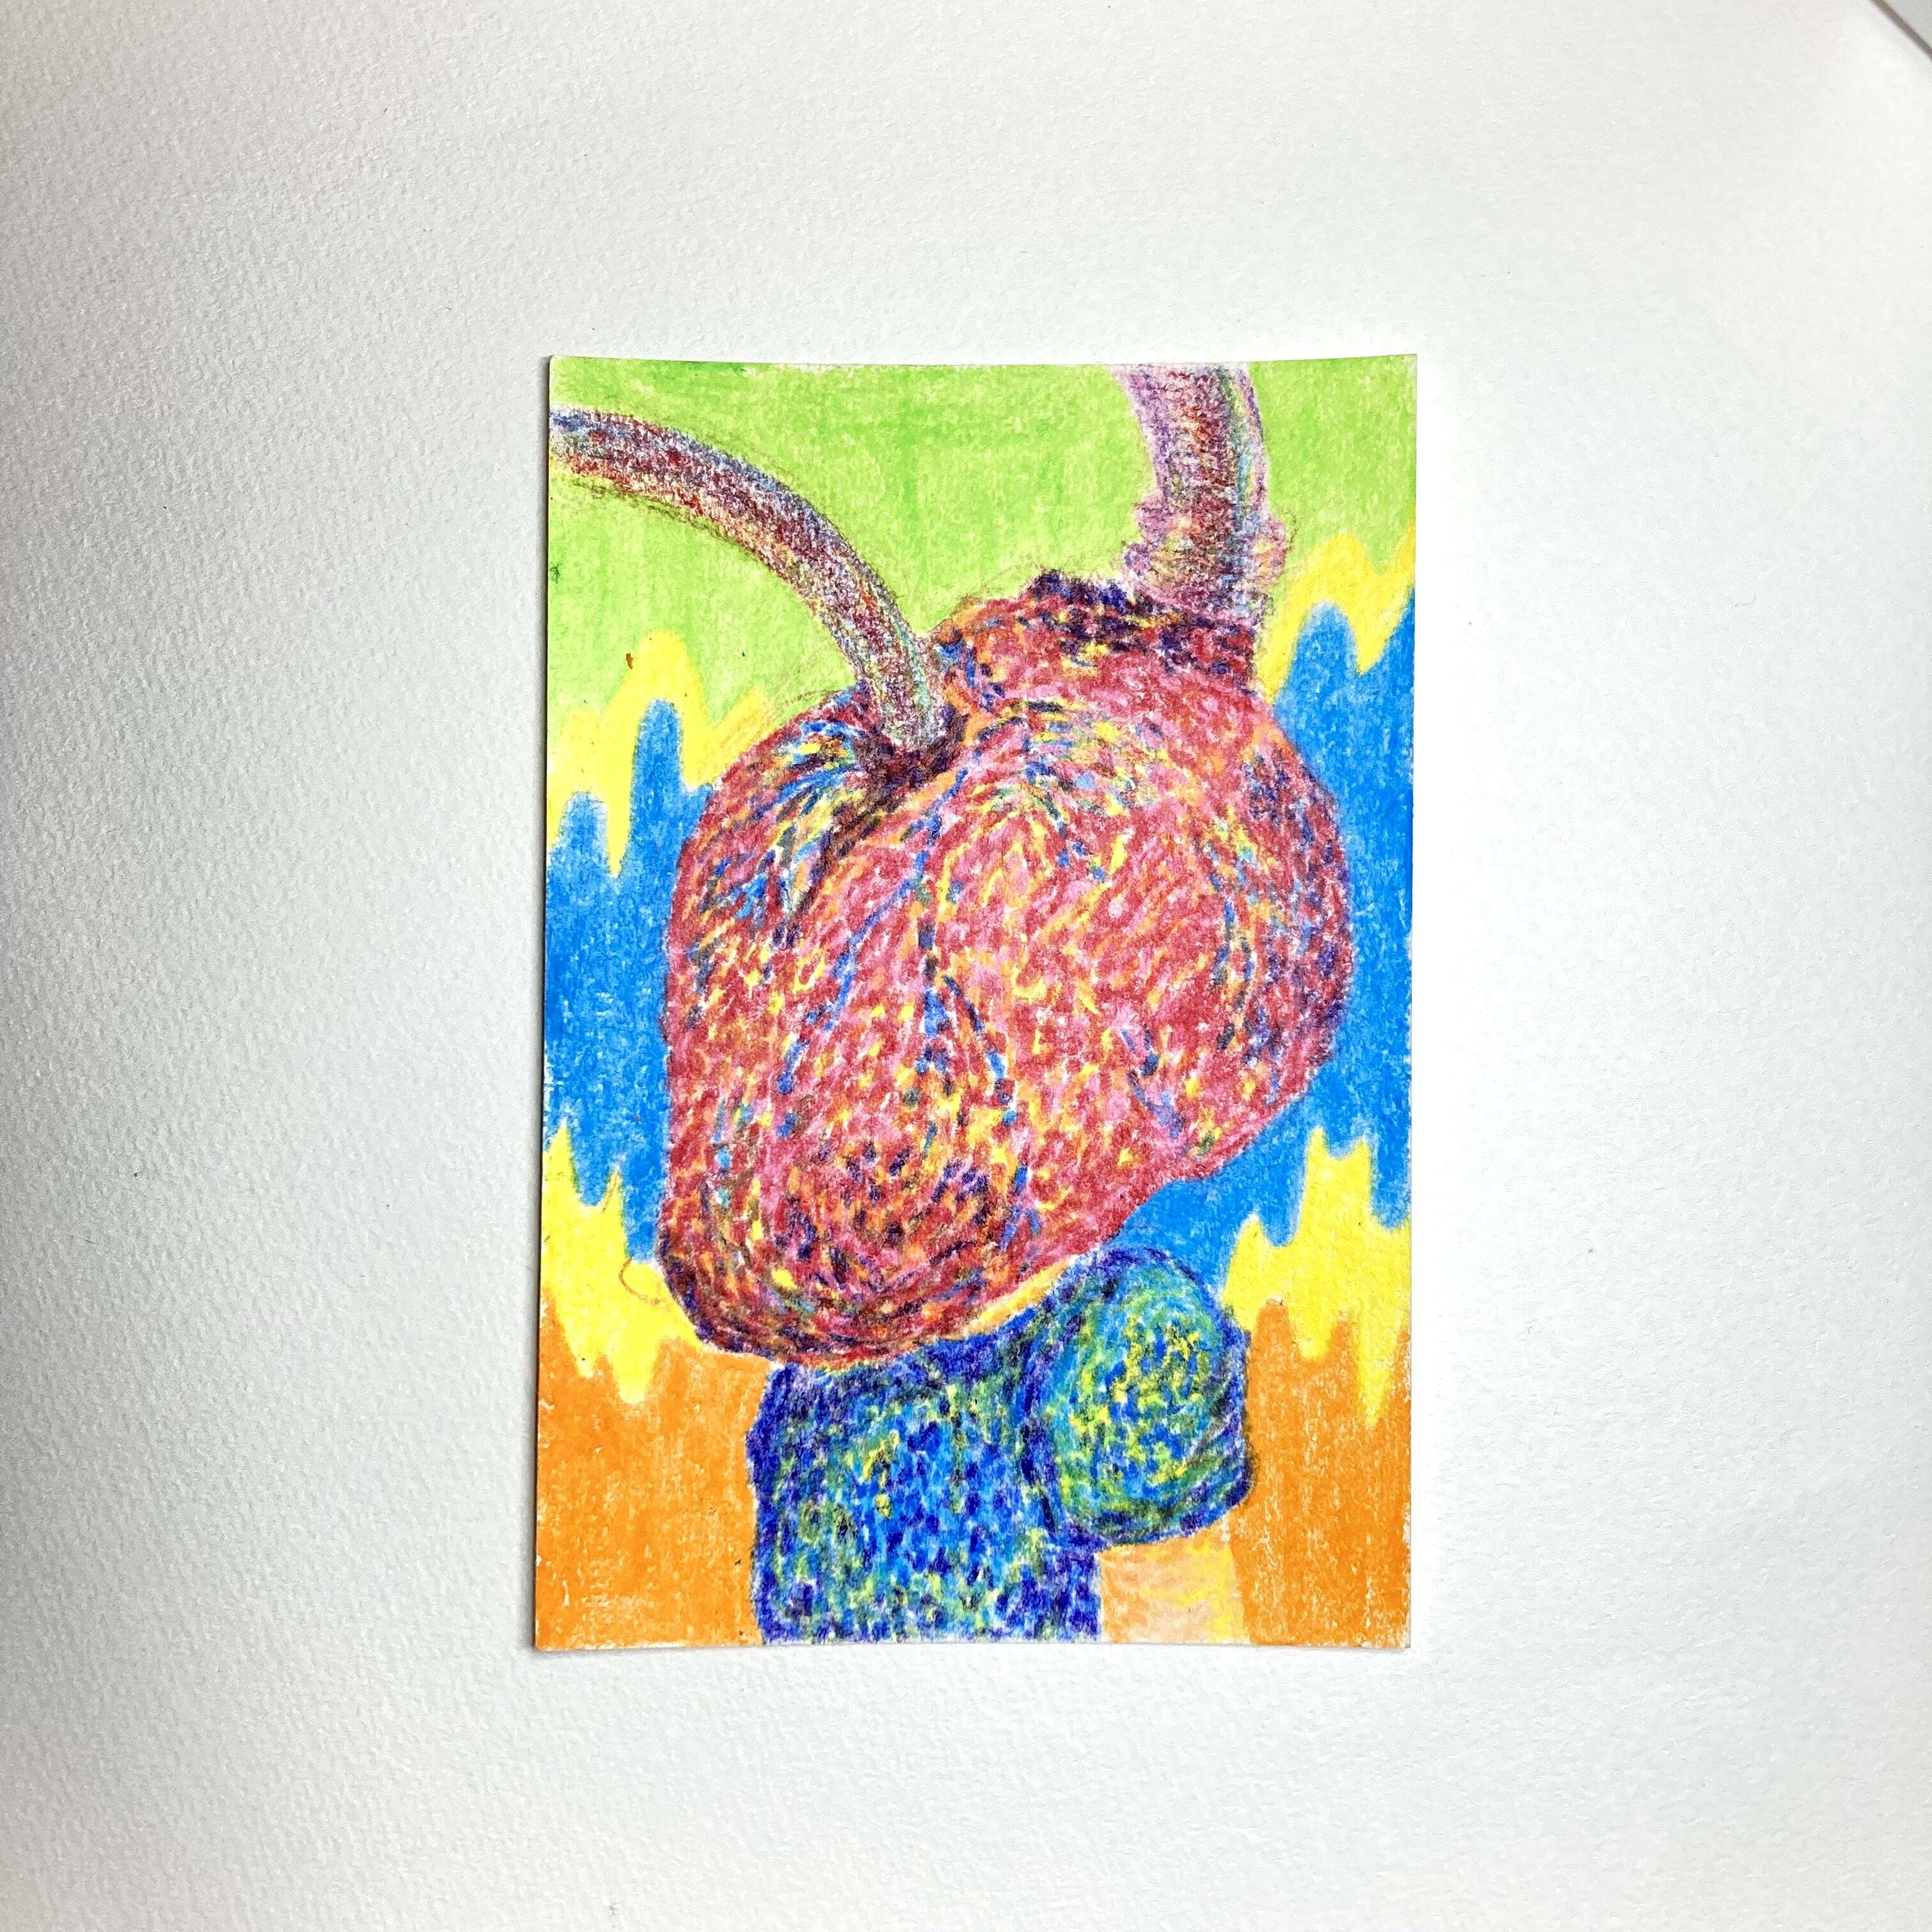 Heart human 8 years old / 100mm×148mm / Crayon / Original Drawing